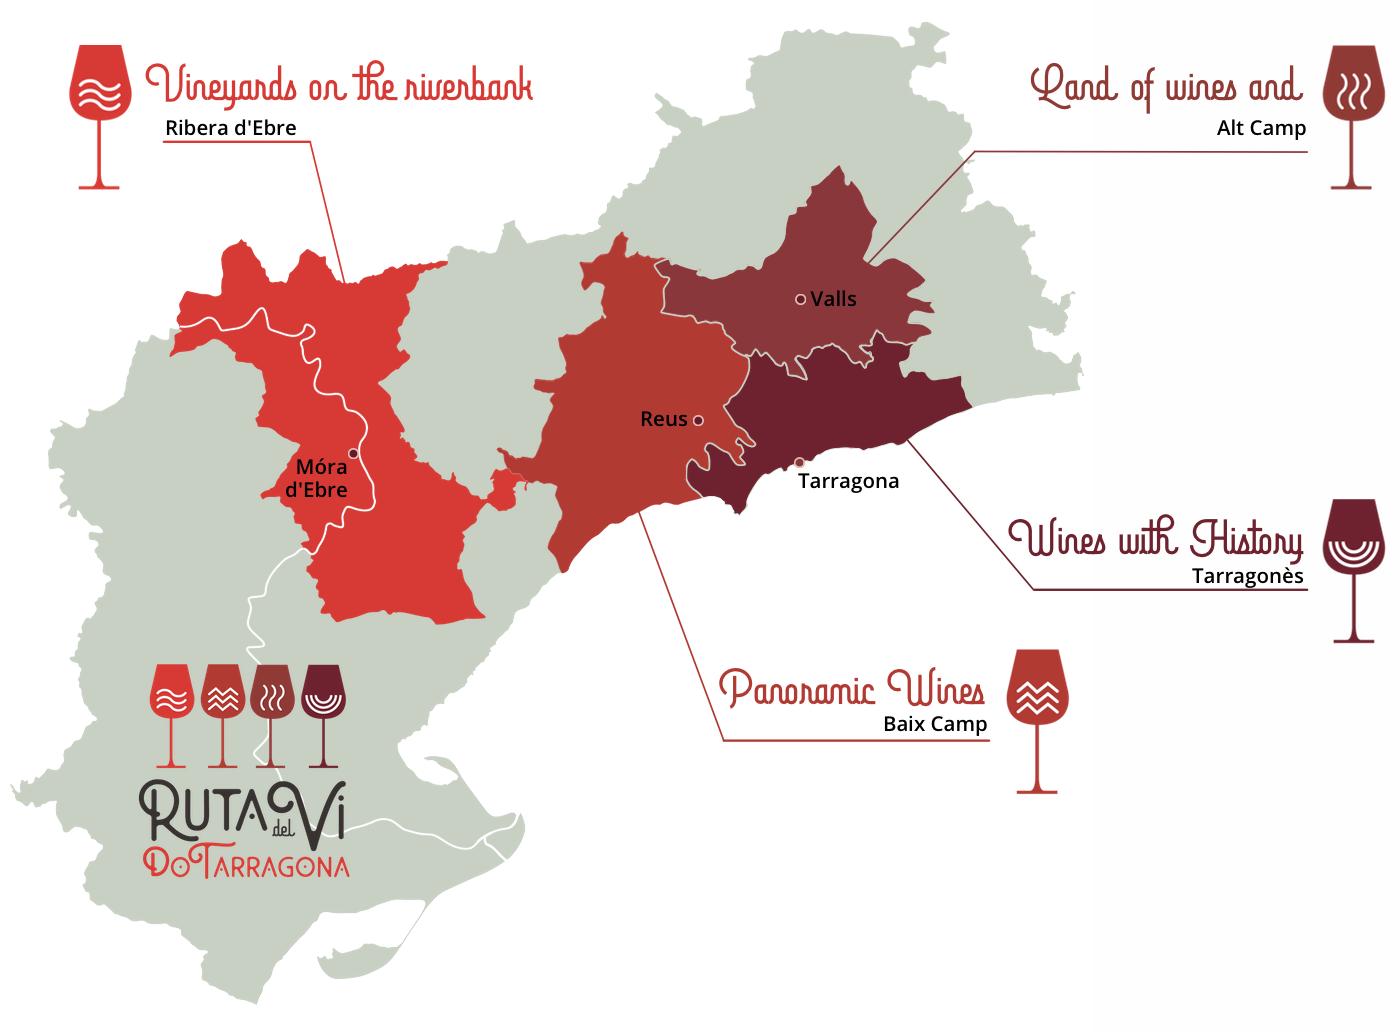 Map of the DO Tarragona